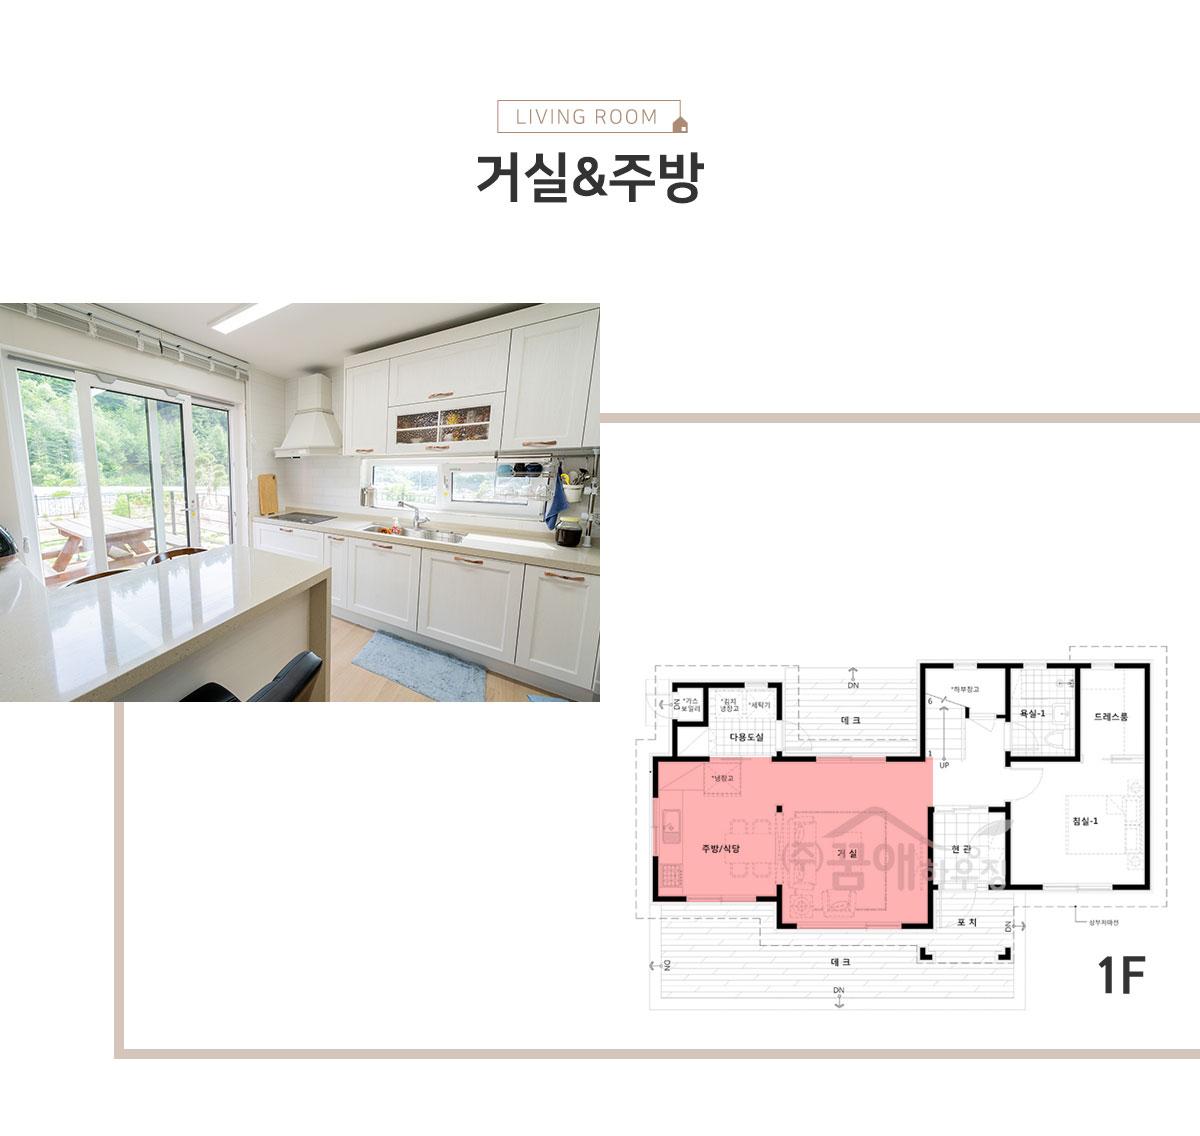 003_living-room_전북-진안읍-반원리_김봉례_01.jpg